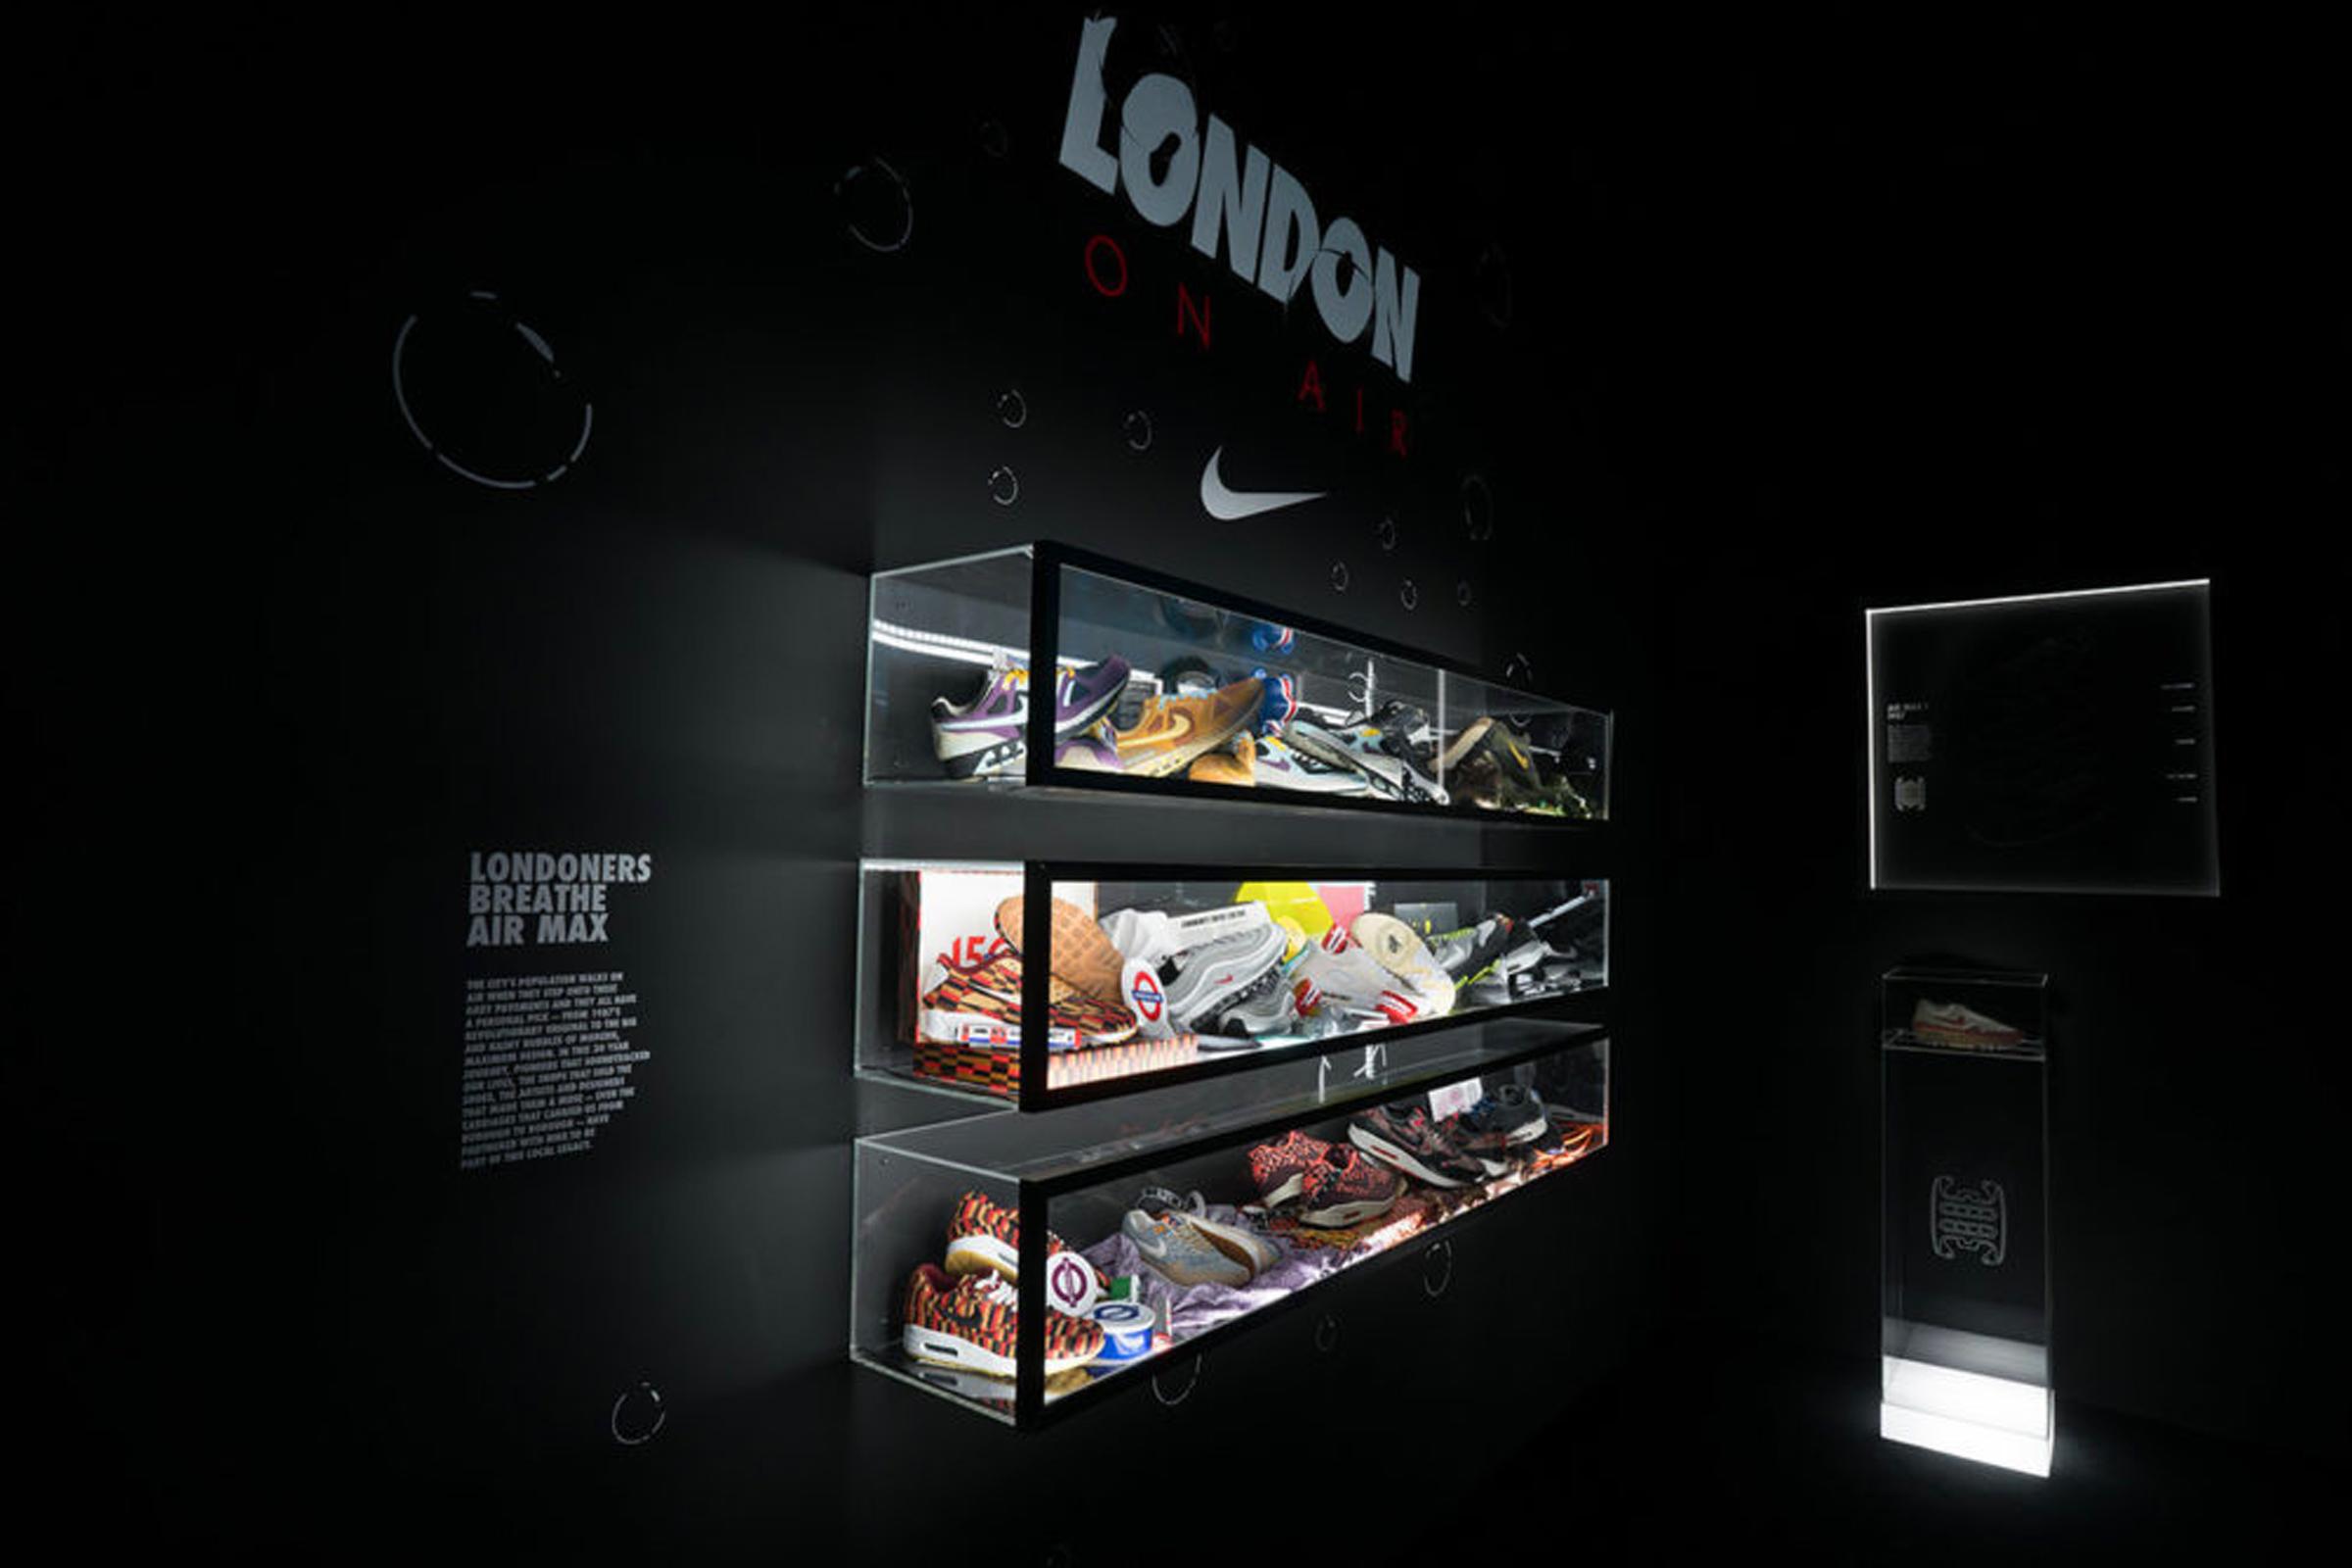 Vivienda líder Poderoso  Nothing Beats a Londoner: Nike's Love Affair With London | Grailed